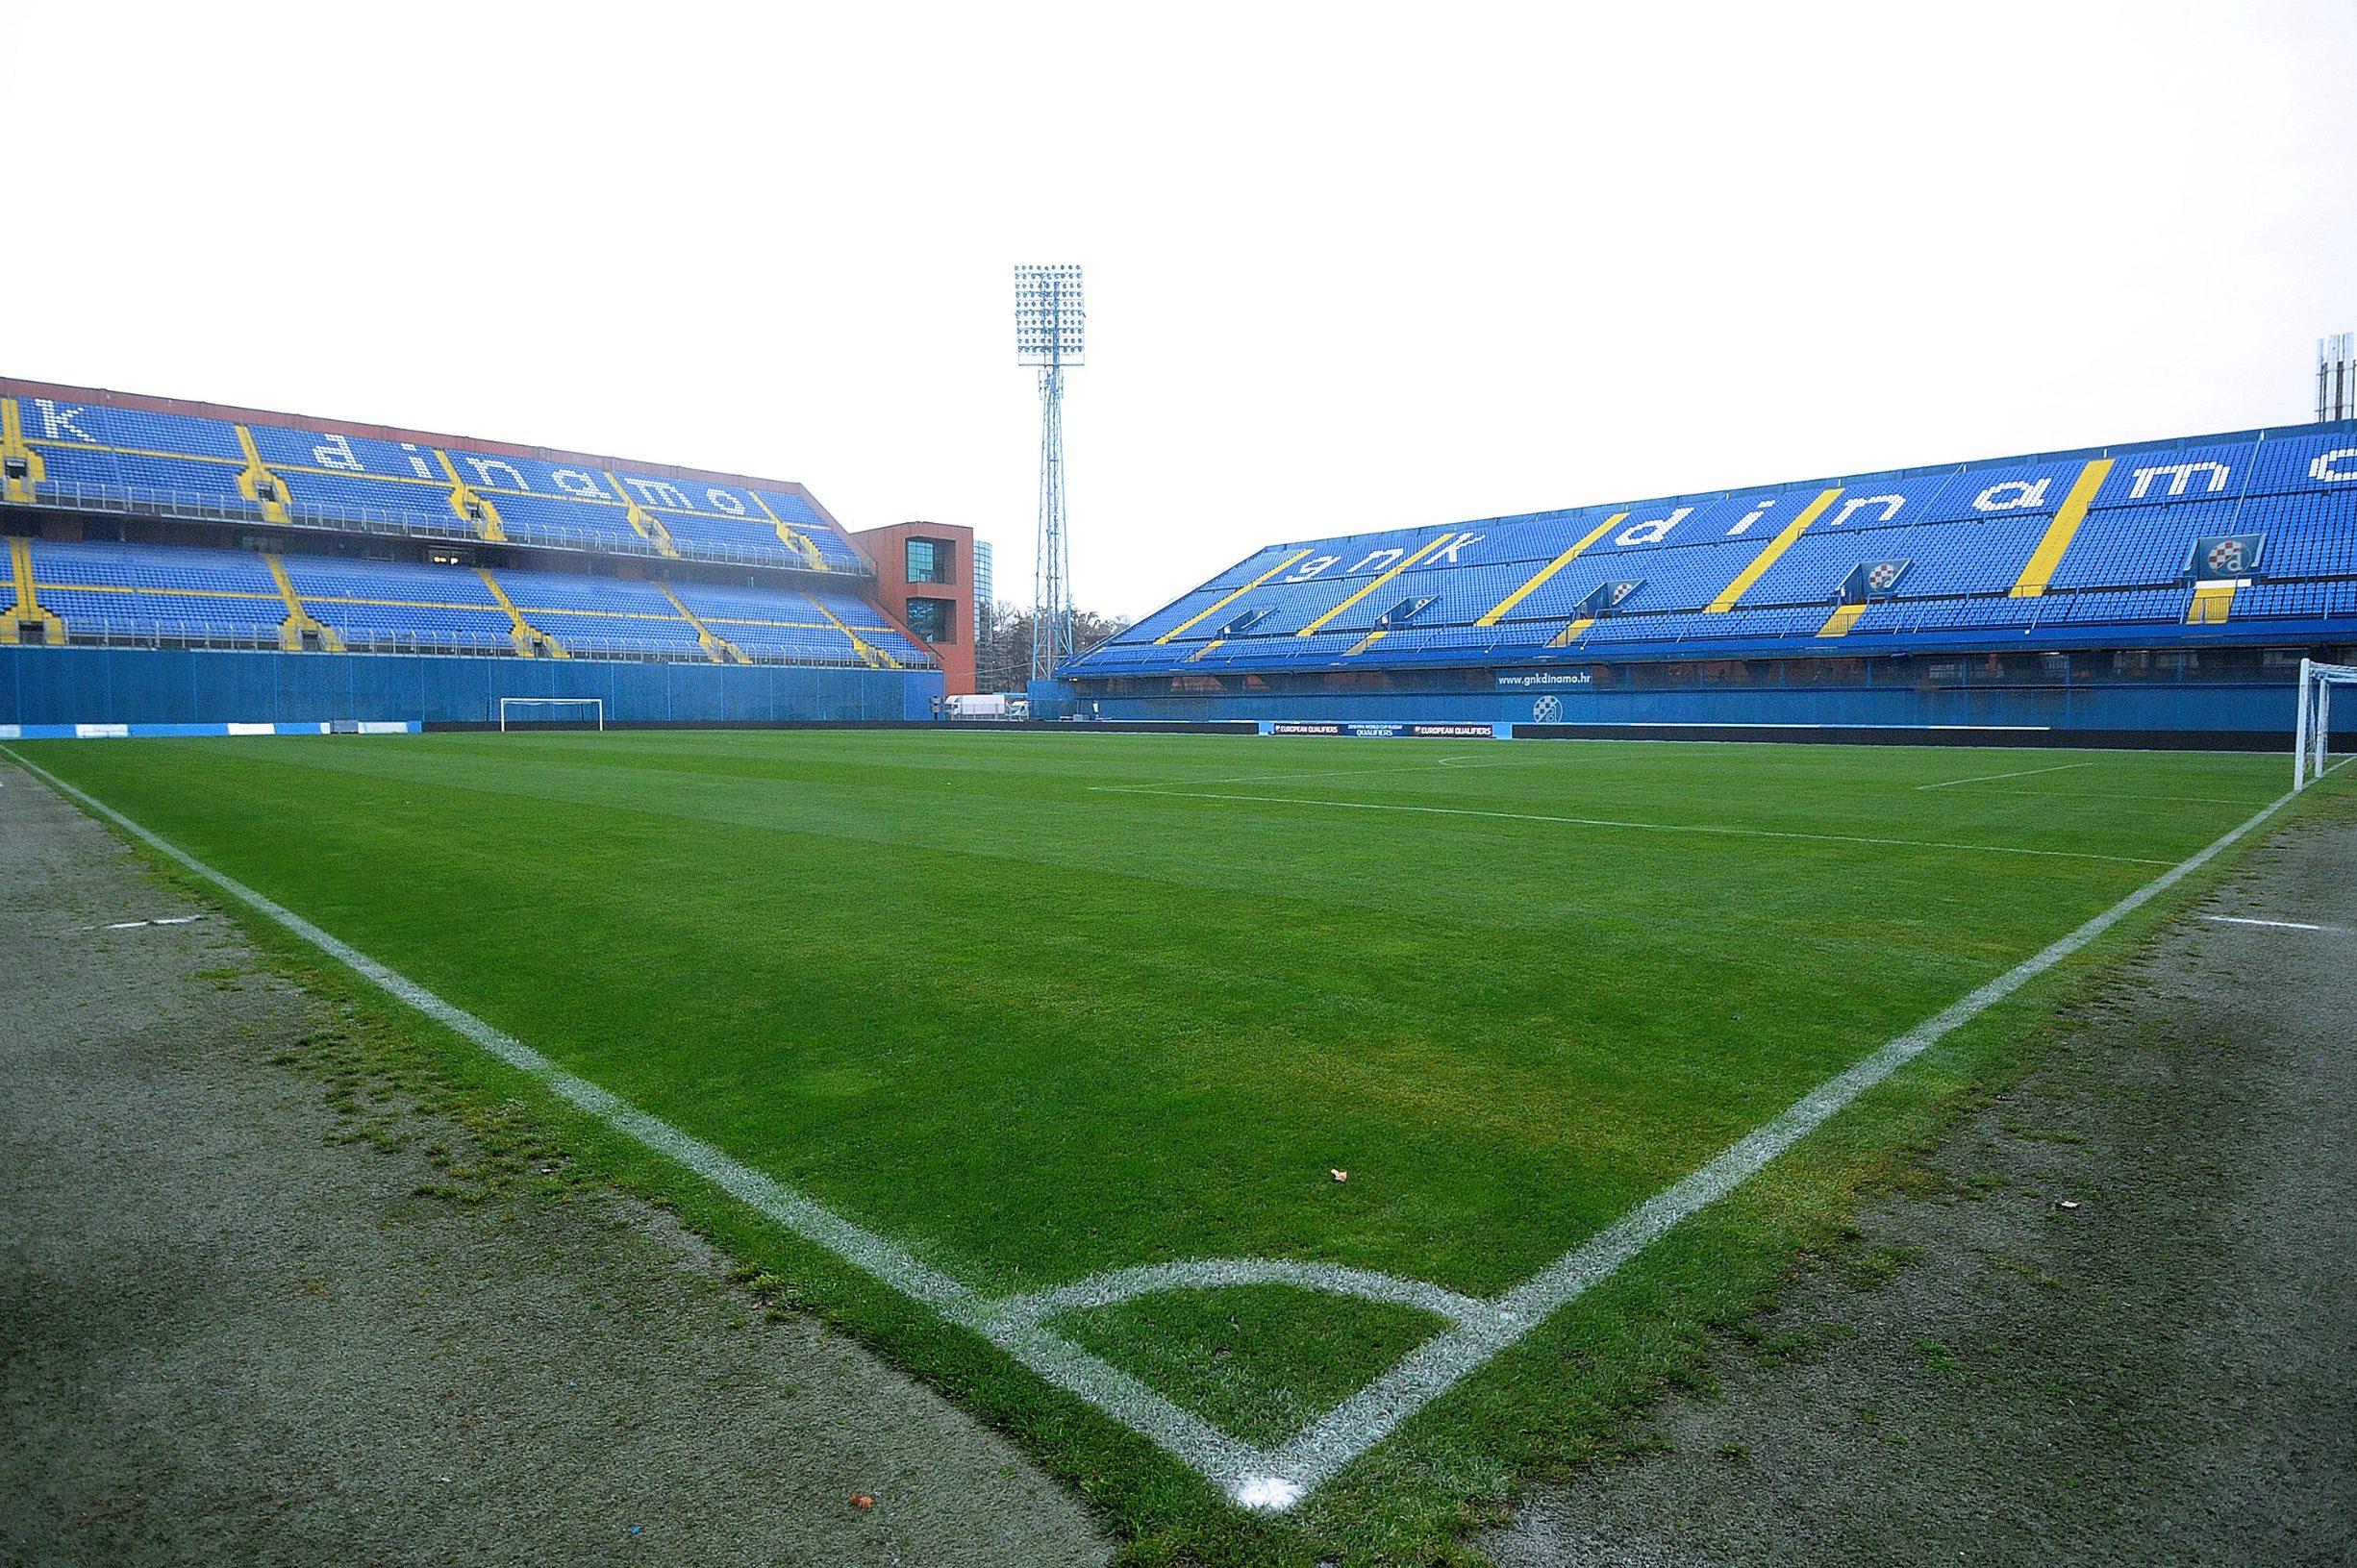 Zagreb, 061117. Stadion Maksimir. Maksimirski travnjak pripremljen i sprema za utakmicu Hrvatska - Grcka. Na fotografiji: travnjak u Maksimiru. Foto: Damir Krajac / CROPIX